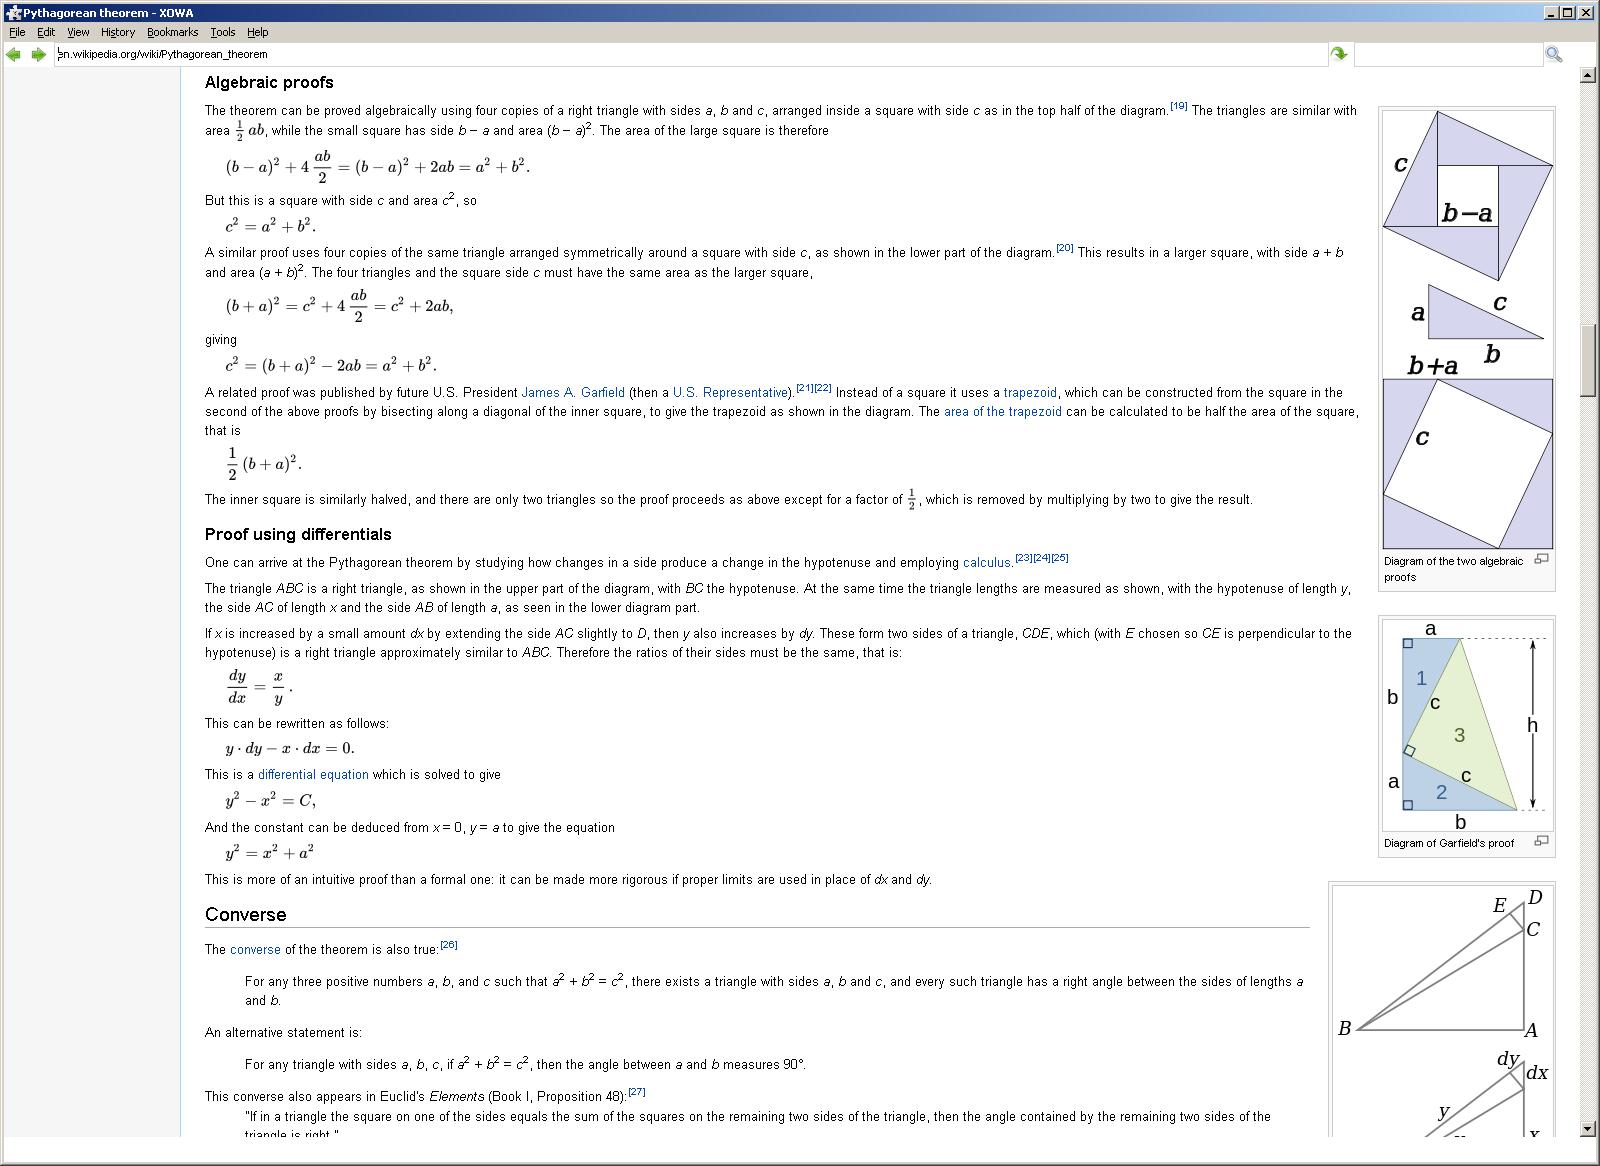 1c54f1364d language Simple English Wiktionary 1383878 - universalsoloads.info